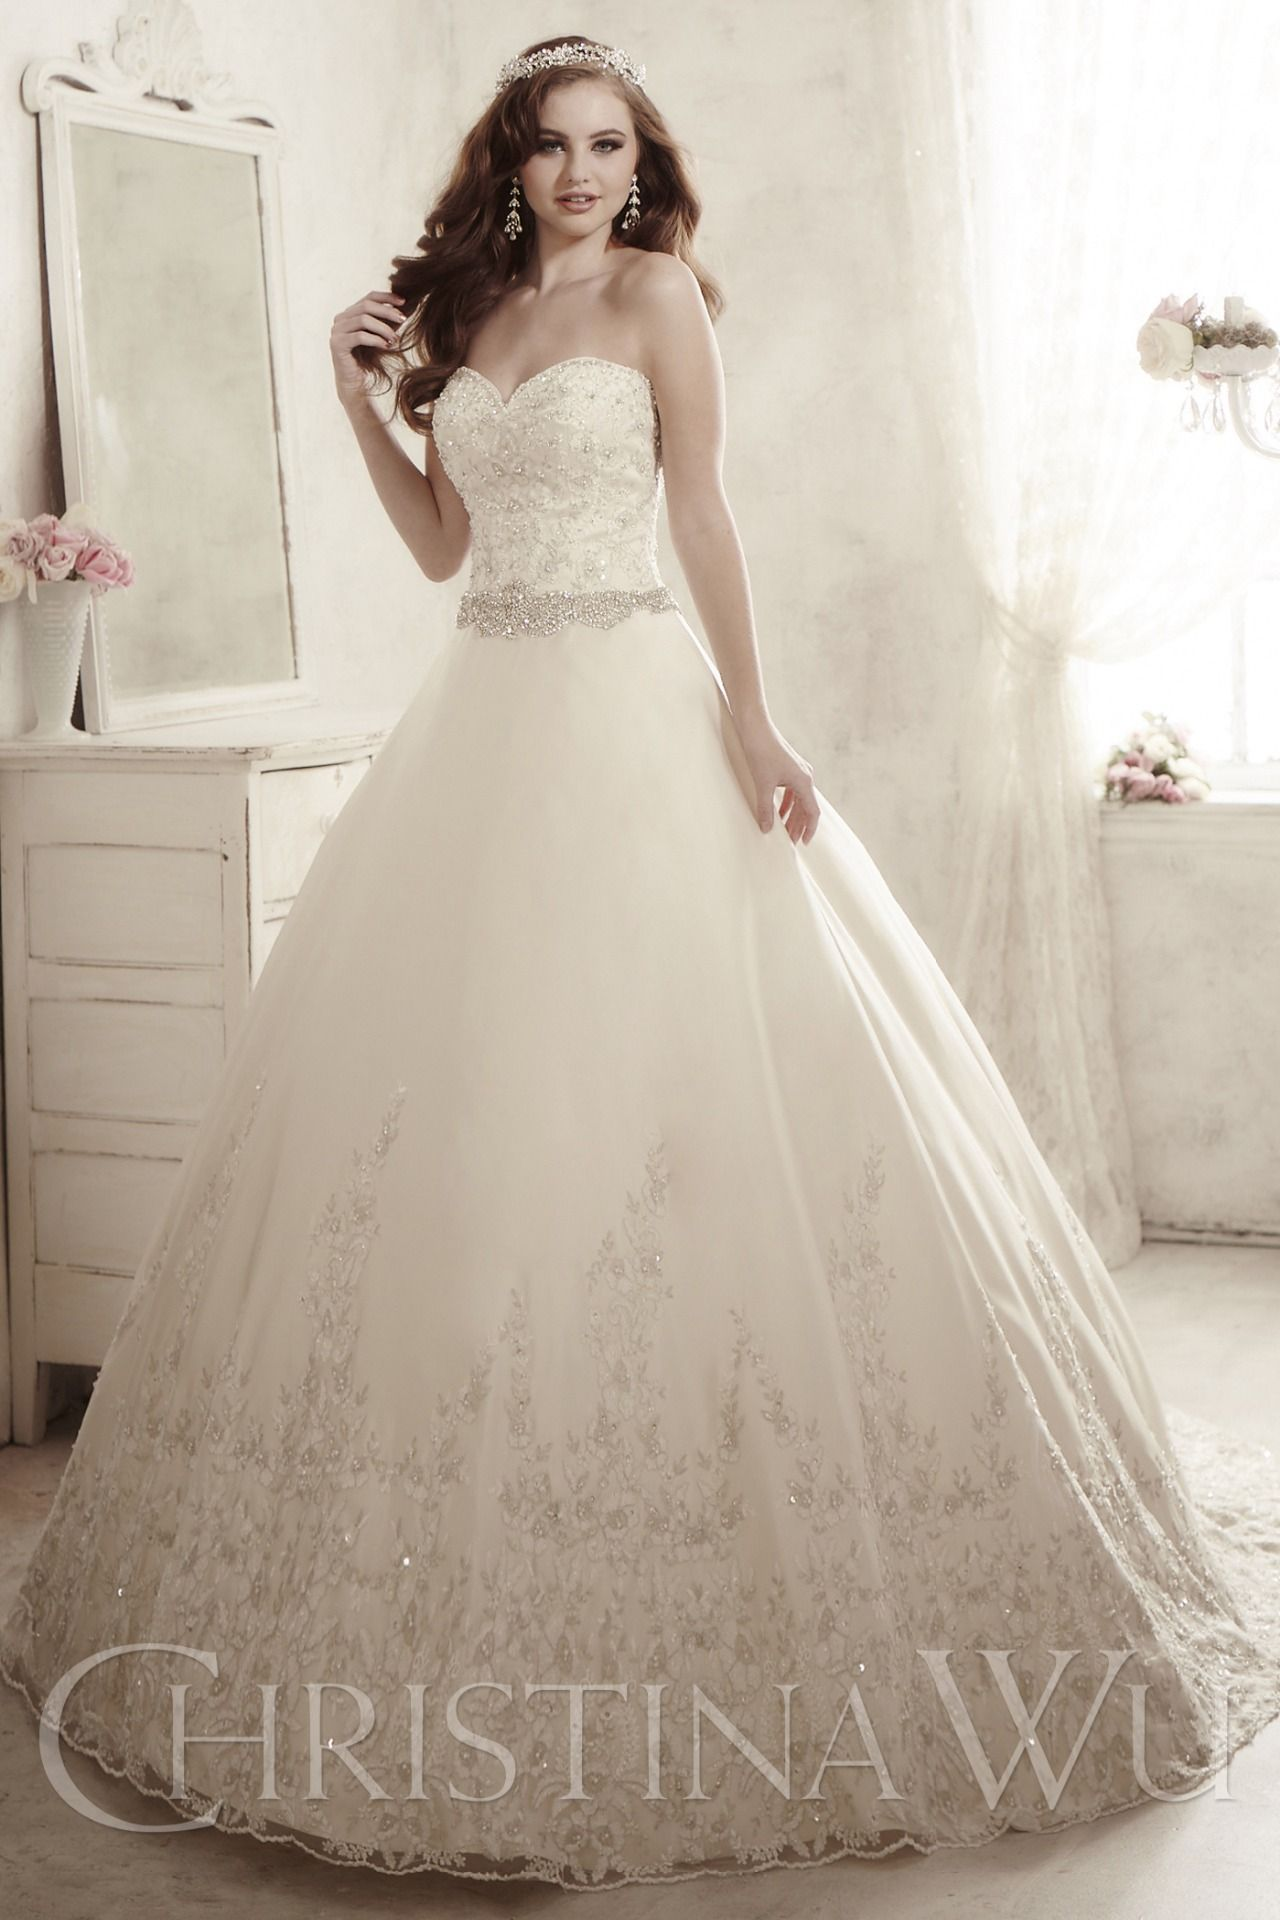 Christina Wu Bridal Gown Newcastle | wedding dresses | Pinterest ...